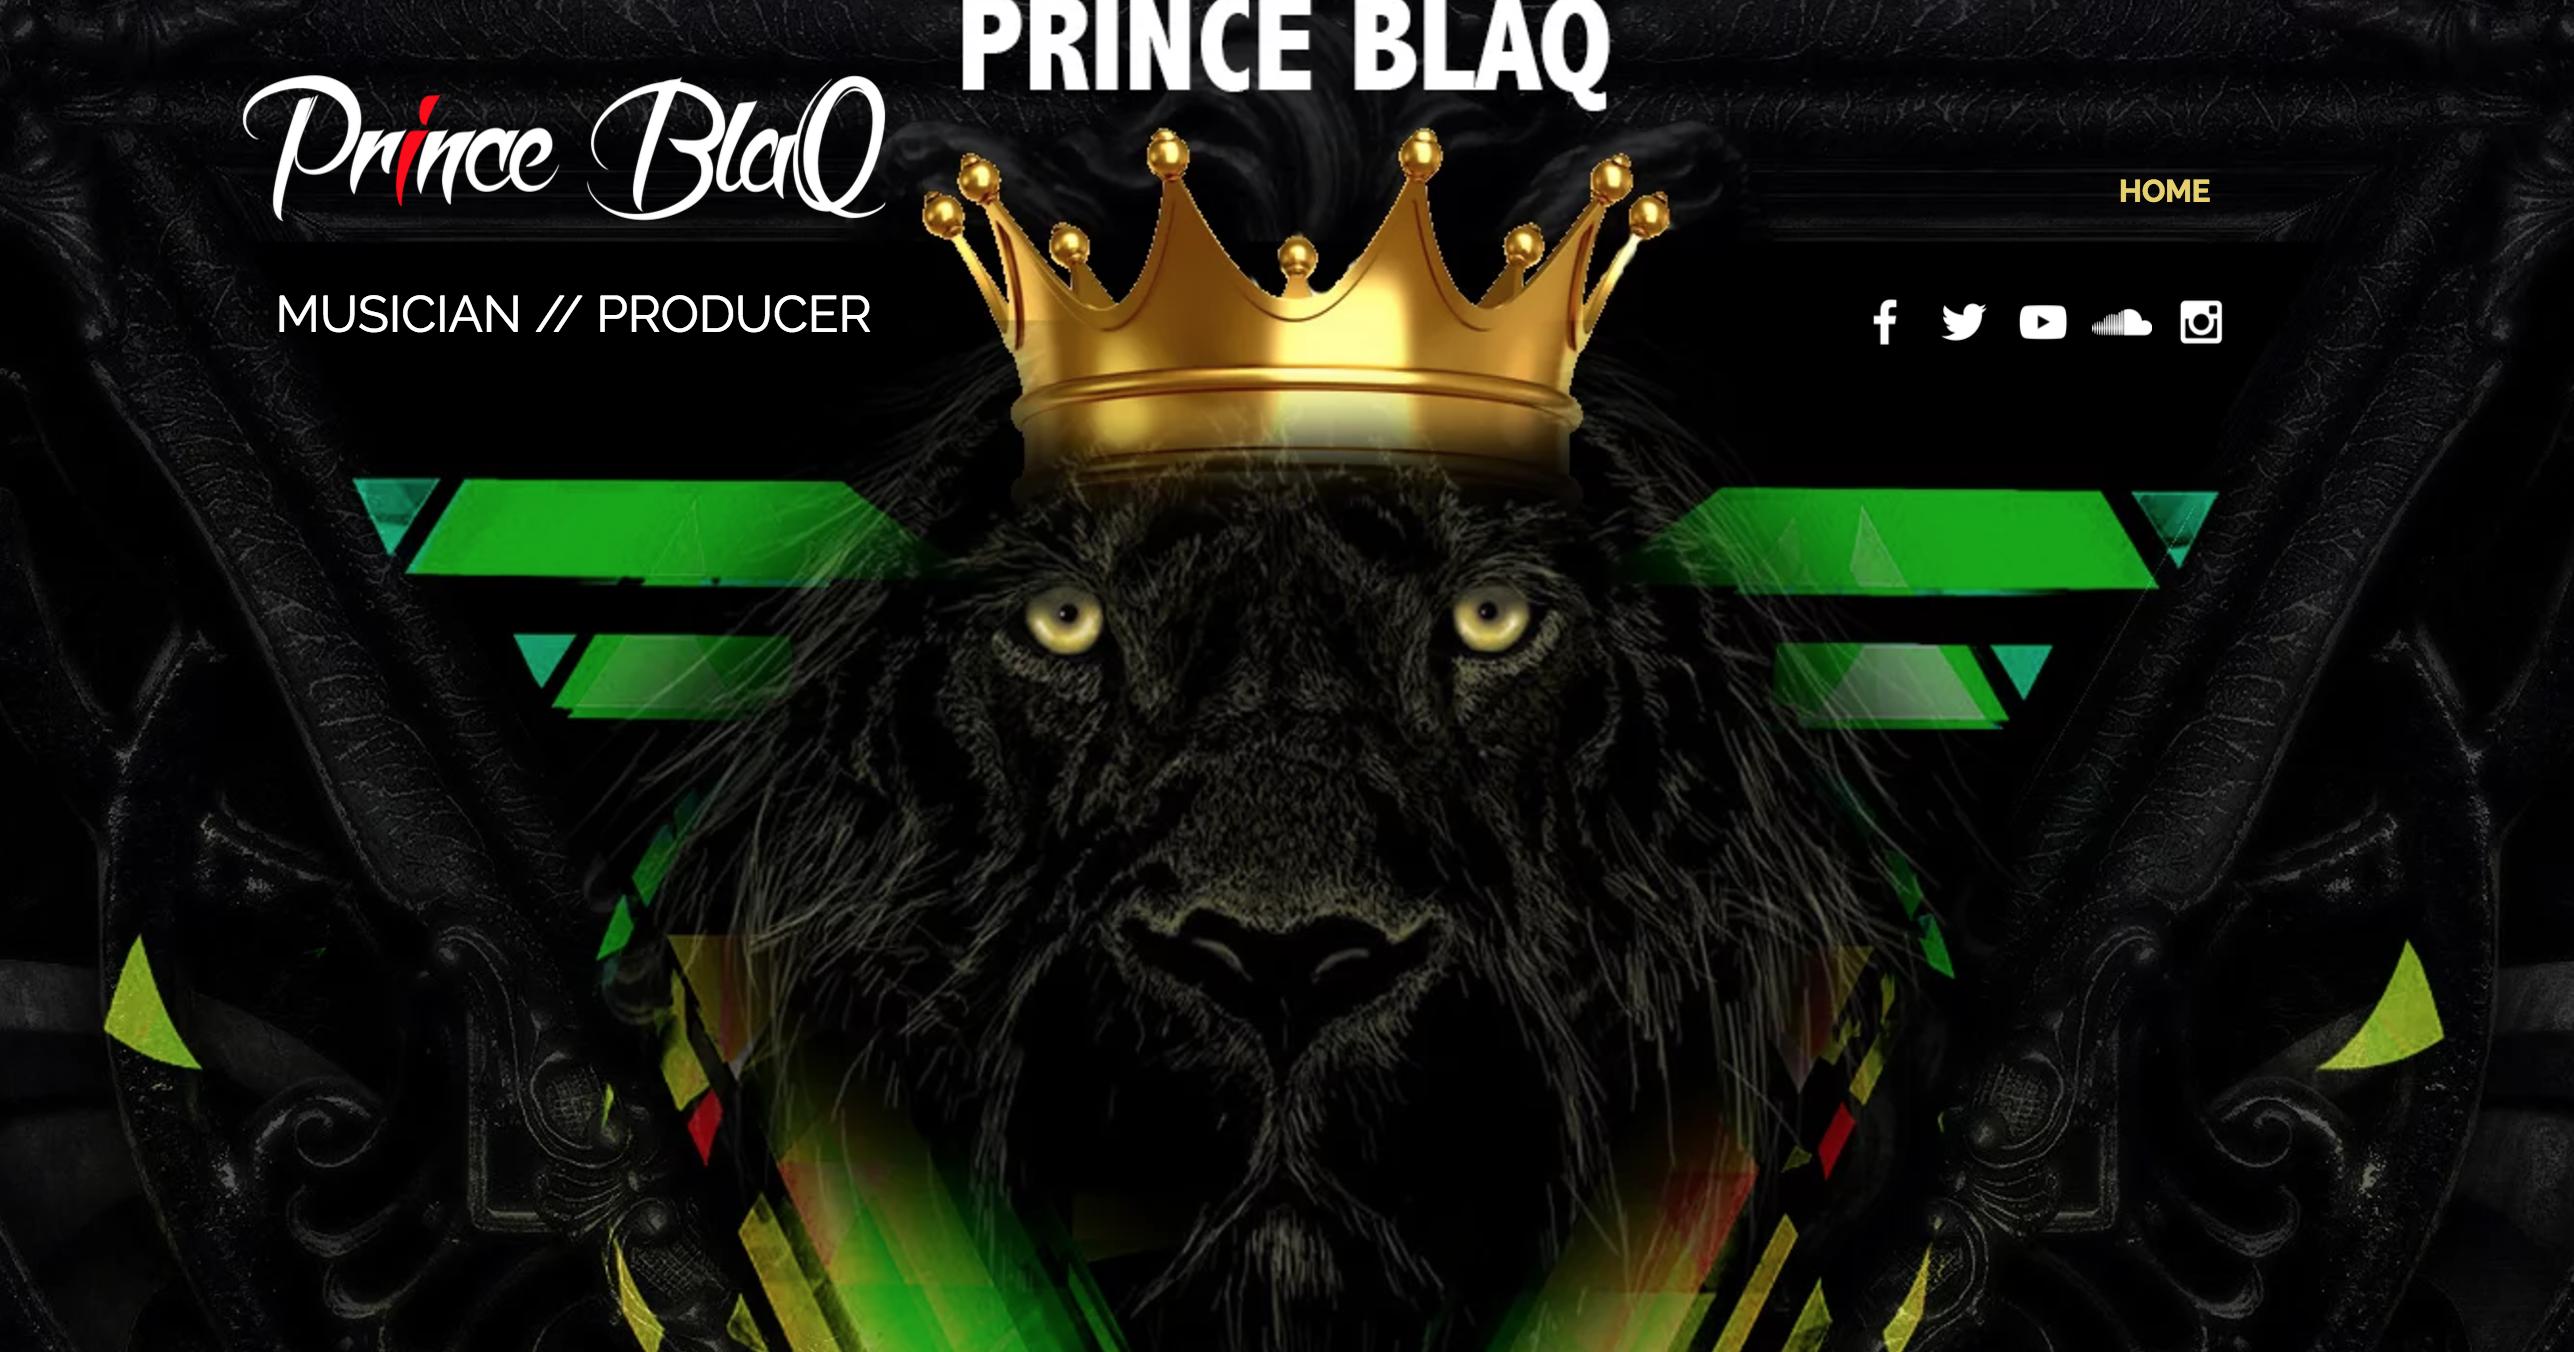 Prince Blaq